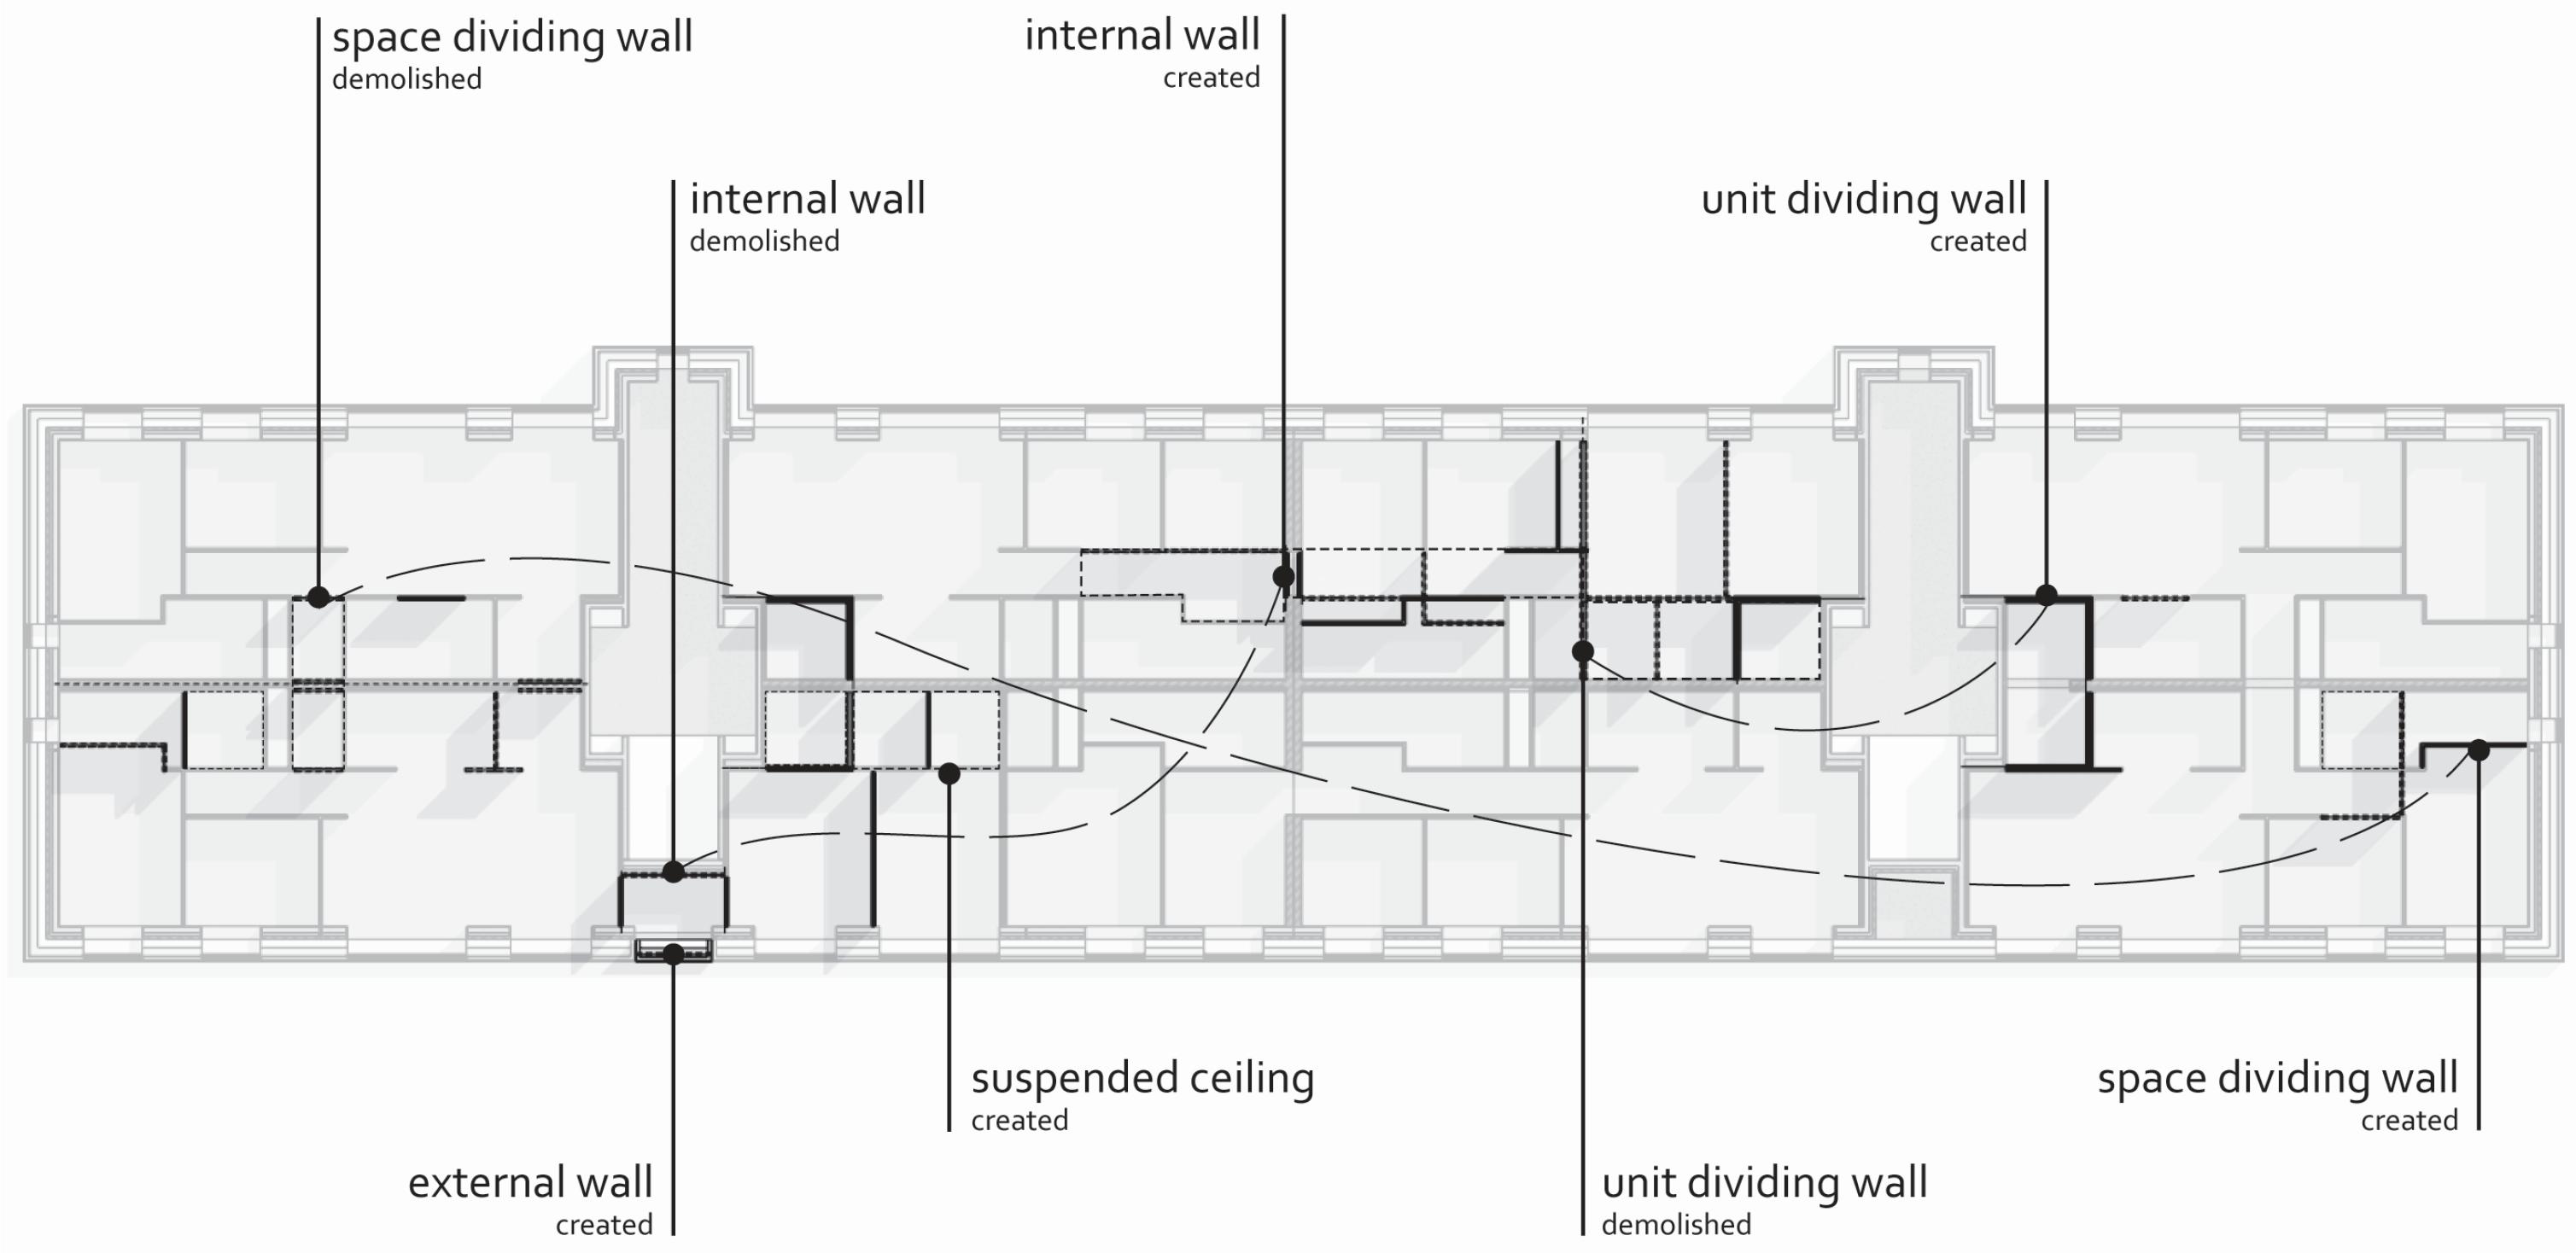 Buildings | Free Full-Text | Integrating Scenarios into Life